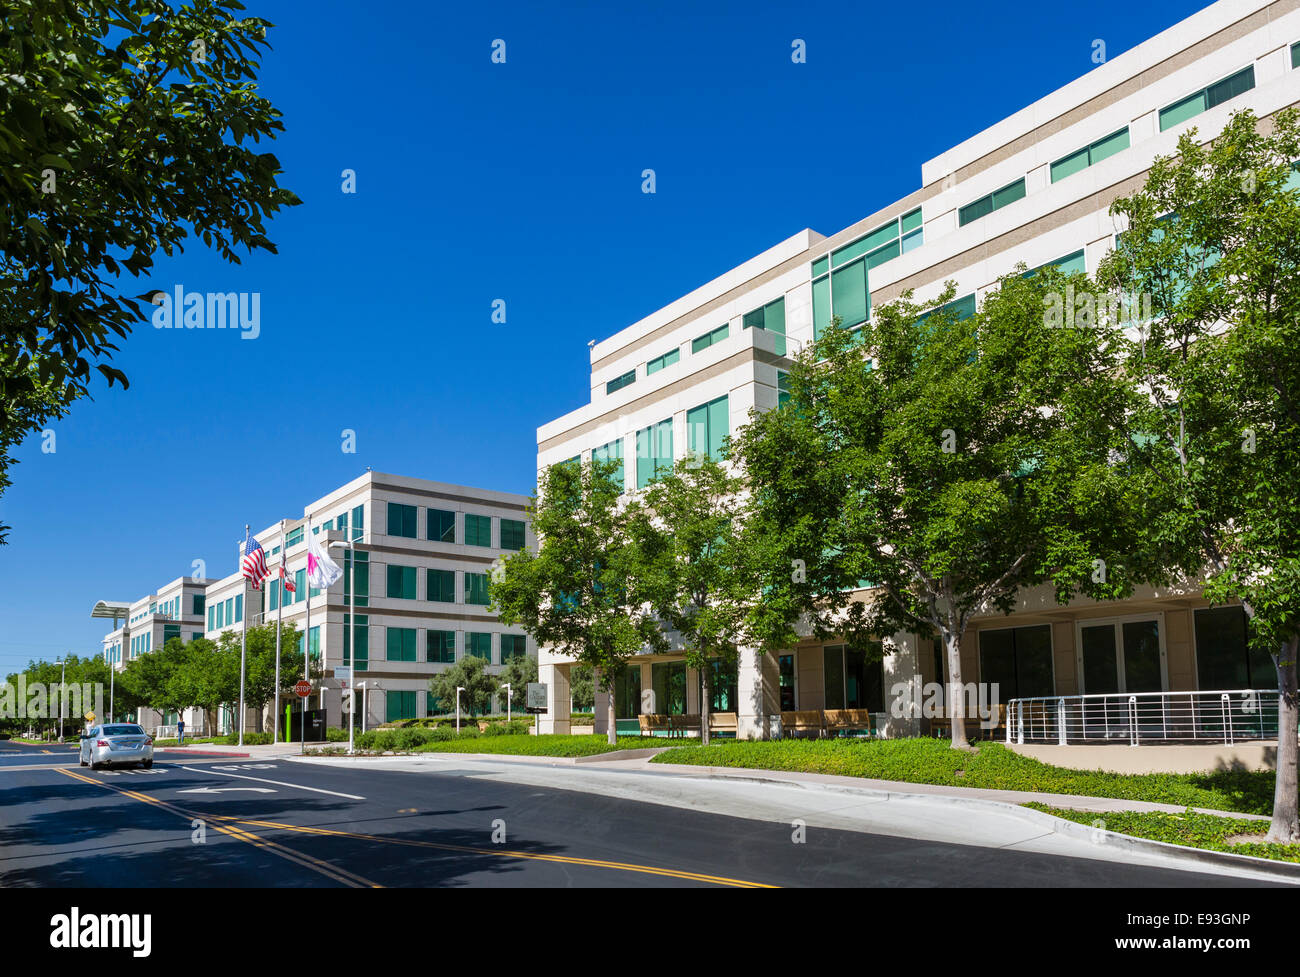 apple cupertino office. Apple Inc Head Office Campus, One Infinite Loop, Cupertino, California, USA Cupertino